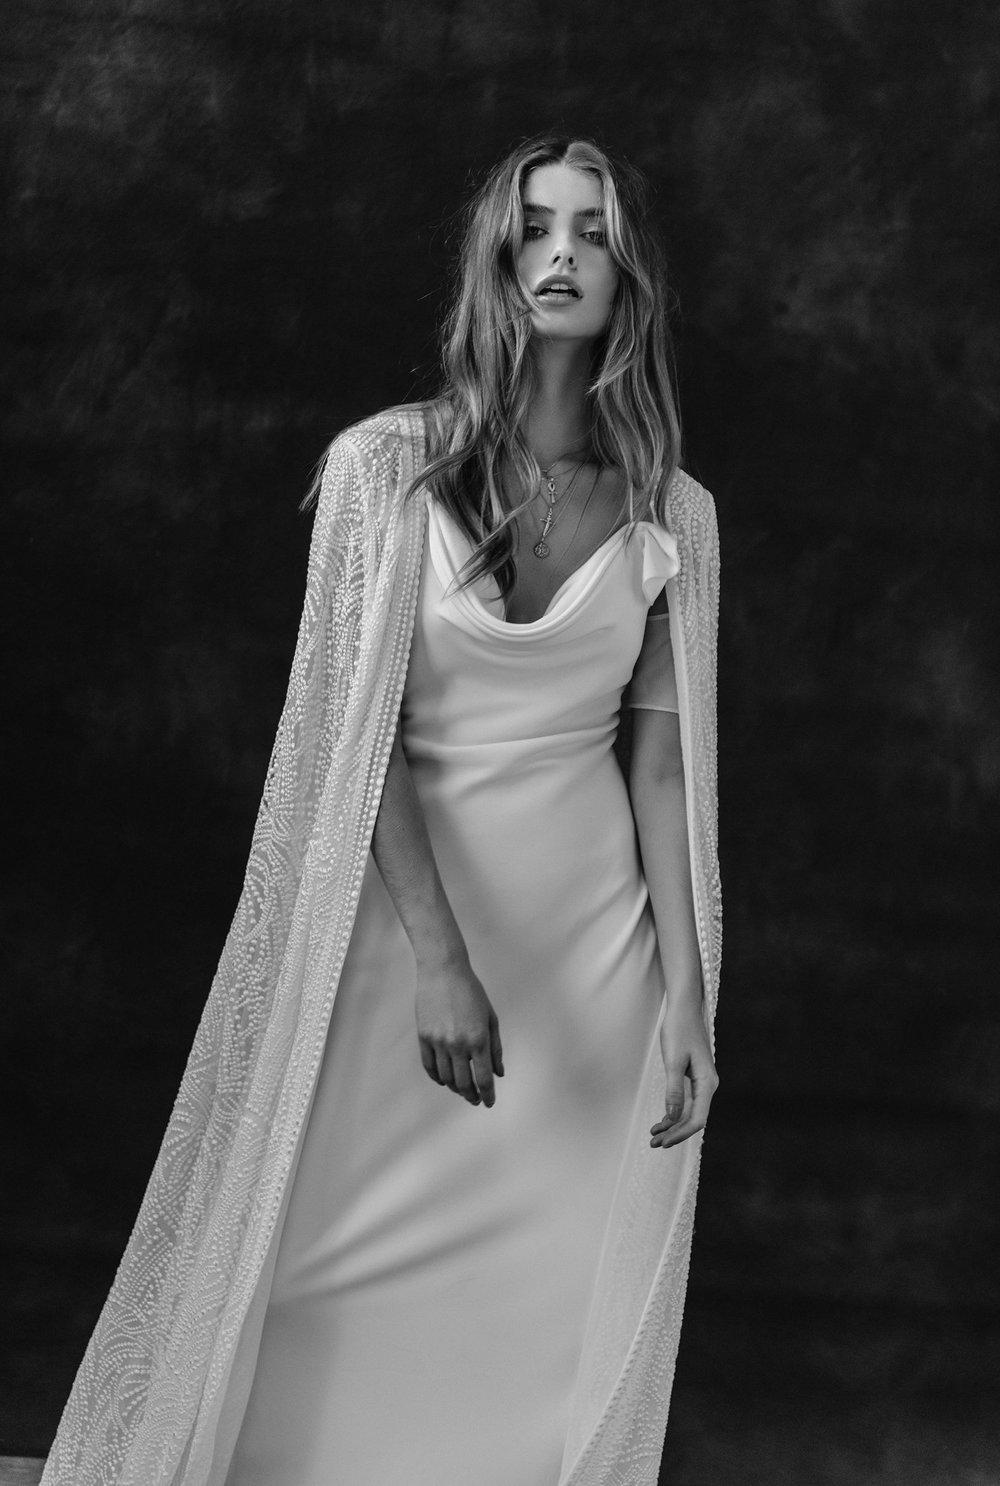 10.-hello-may-magazine-bridal-fashion-editorial-jack-steel-photography-Savannah-Miller-dress-Tadashi-Shoji-cape-Love-Marie-Bridal-Boutique-1.jpg